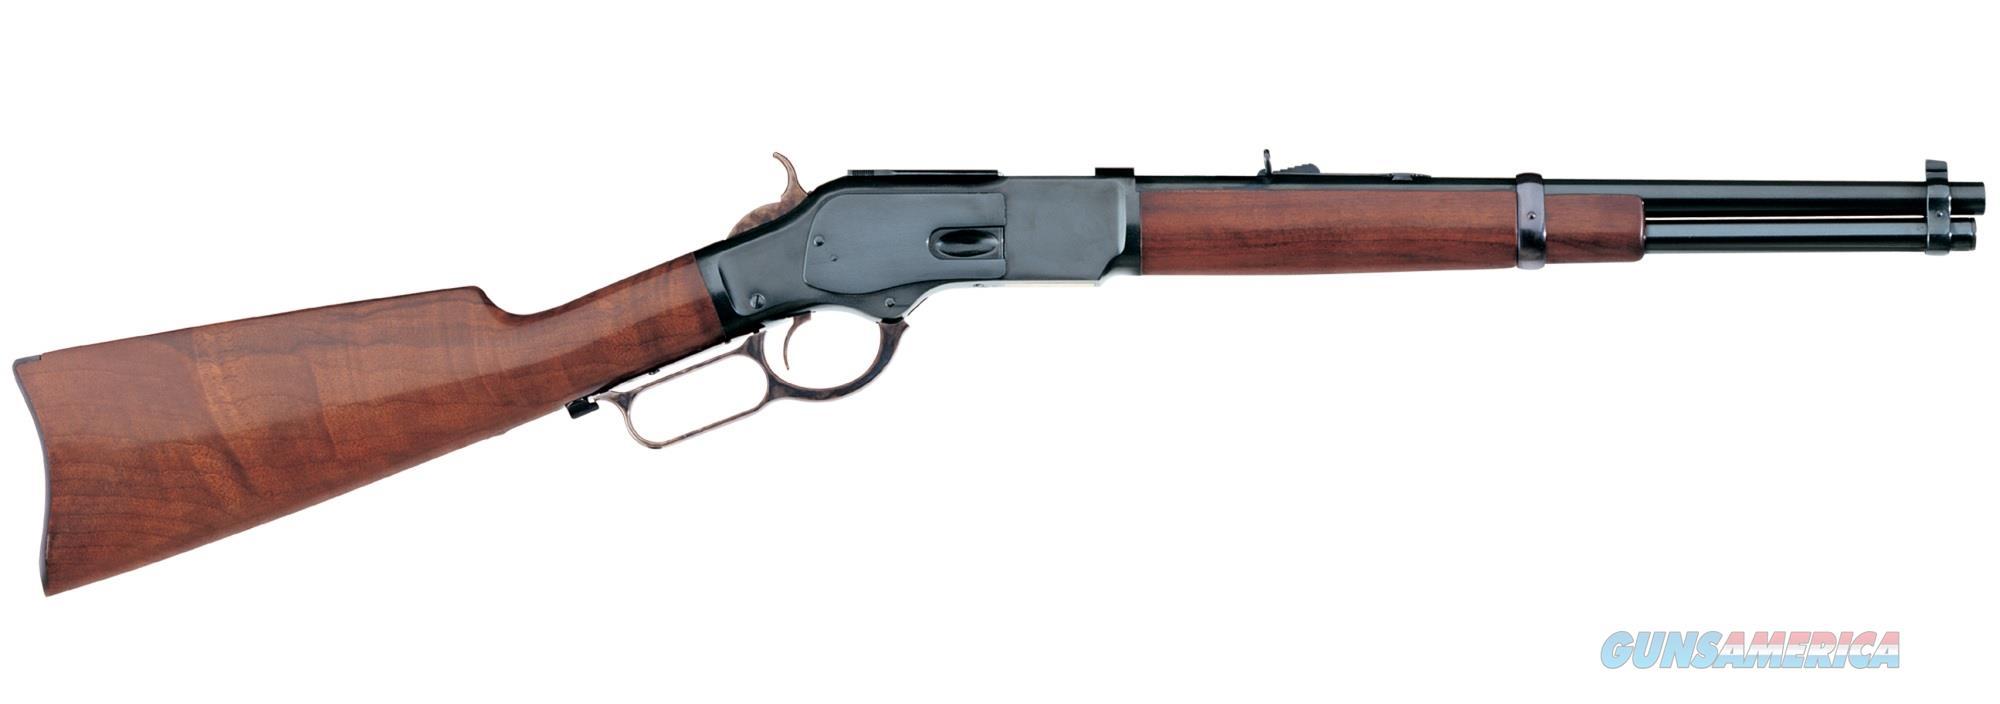 "Uberti 1873 Carbine Rifle .357 Magnum 19"" 342700  Guns > Rifles > Uberti Rifles > Lever Action"